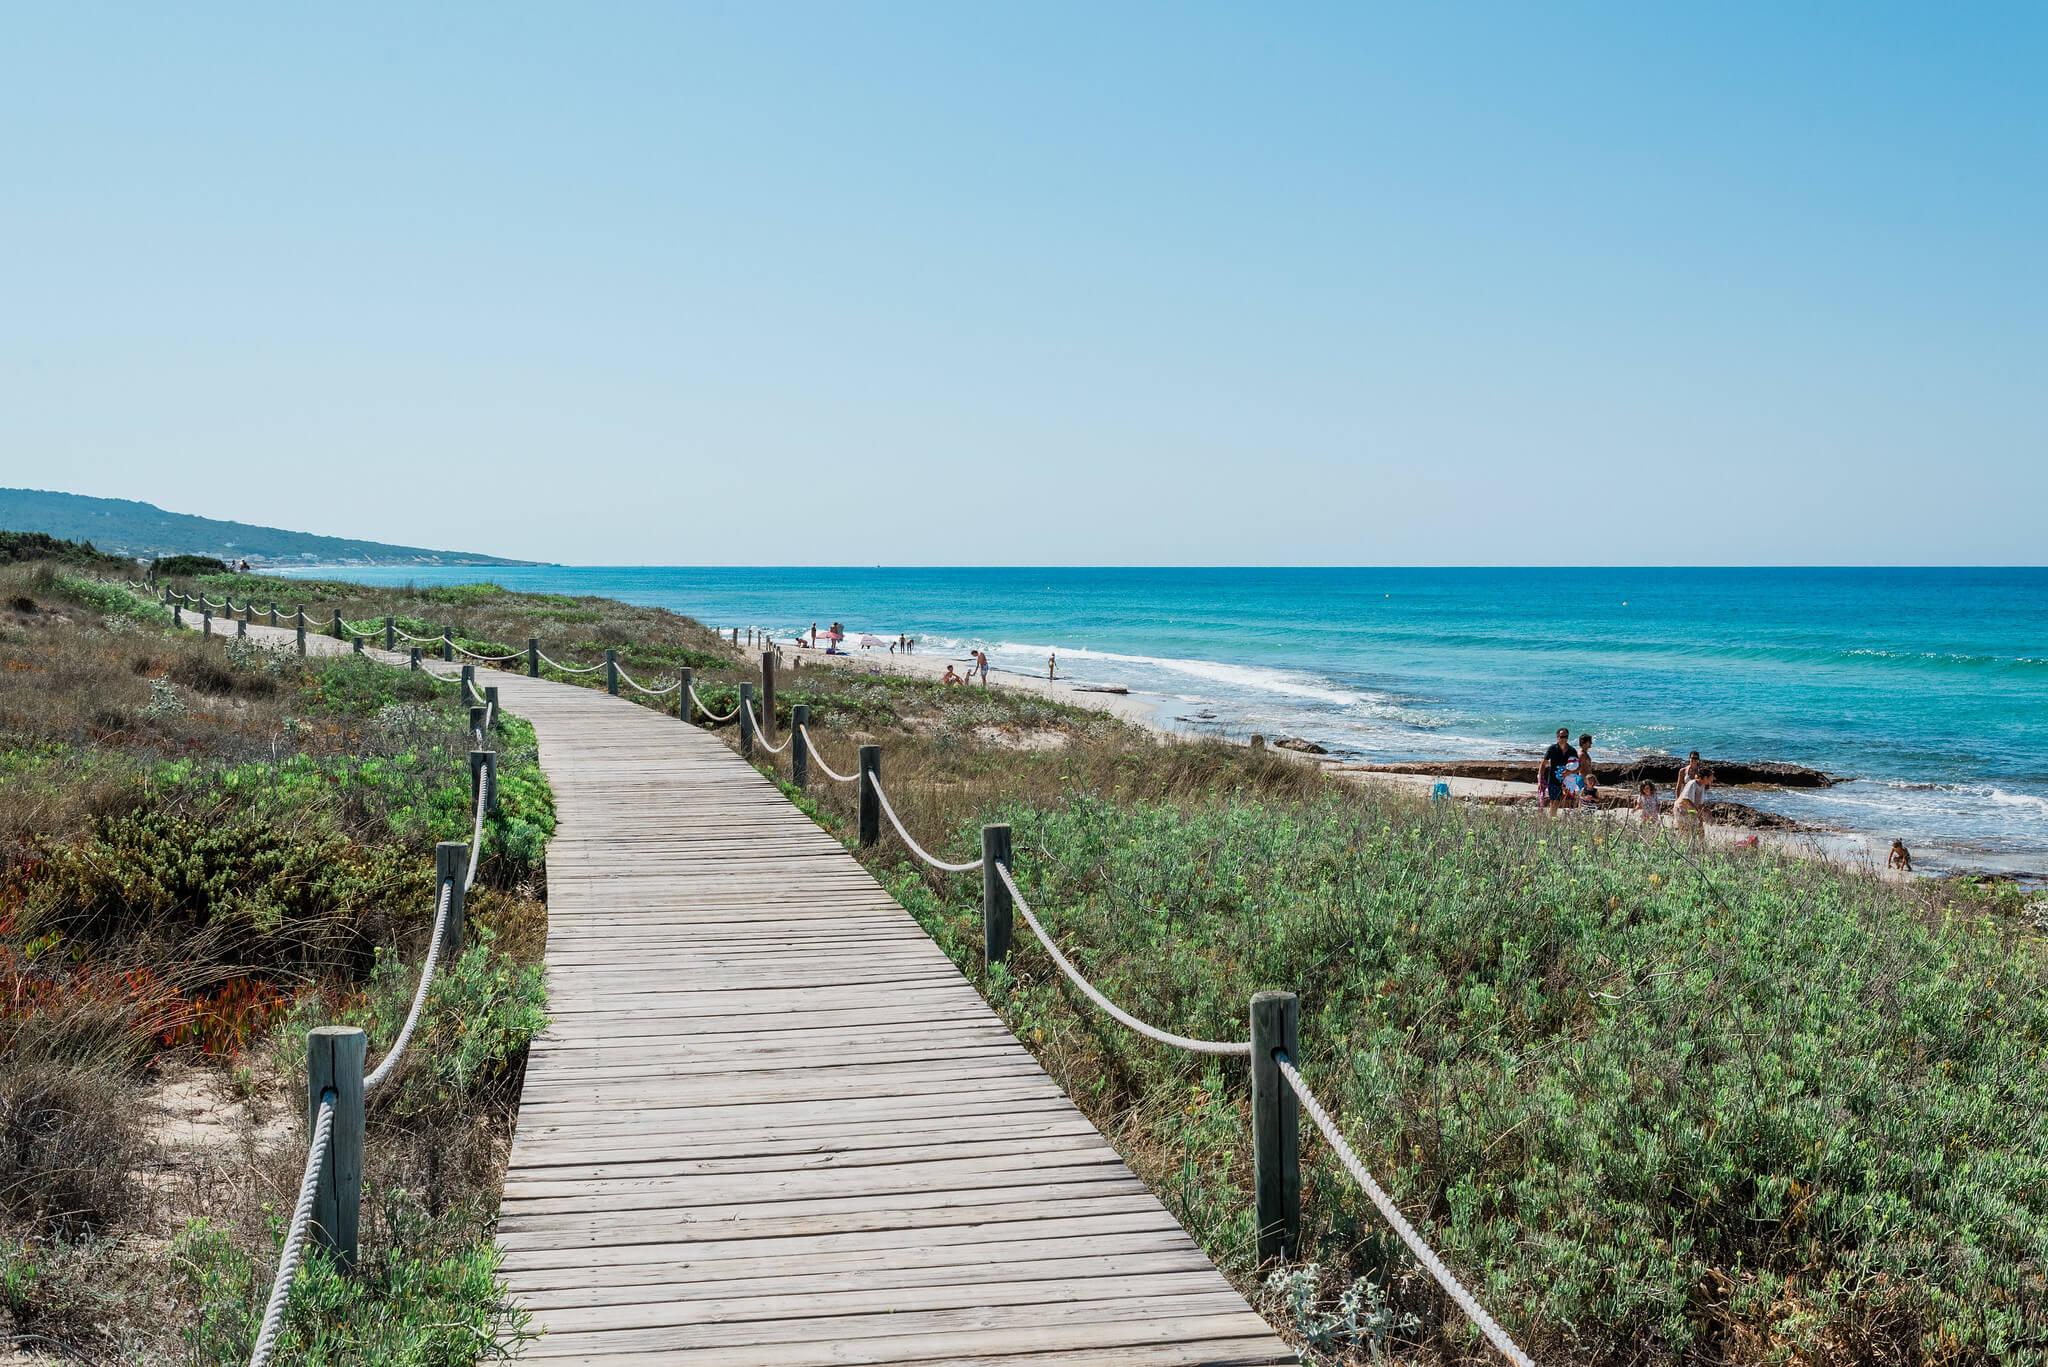 https://www.white-ibiza.com/wp-content/uploads/2020/03/formentera-beaches-migjorn-2020-02.jpg